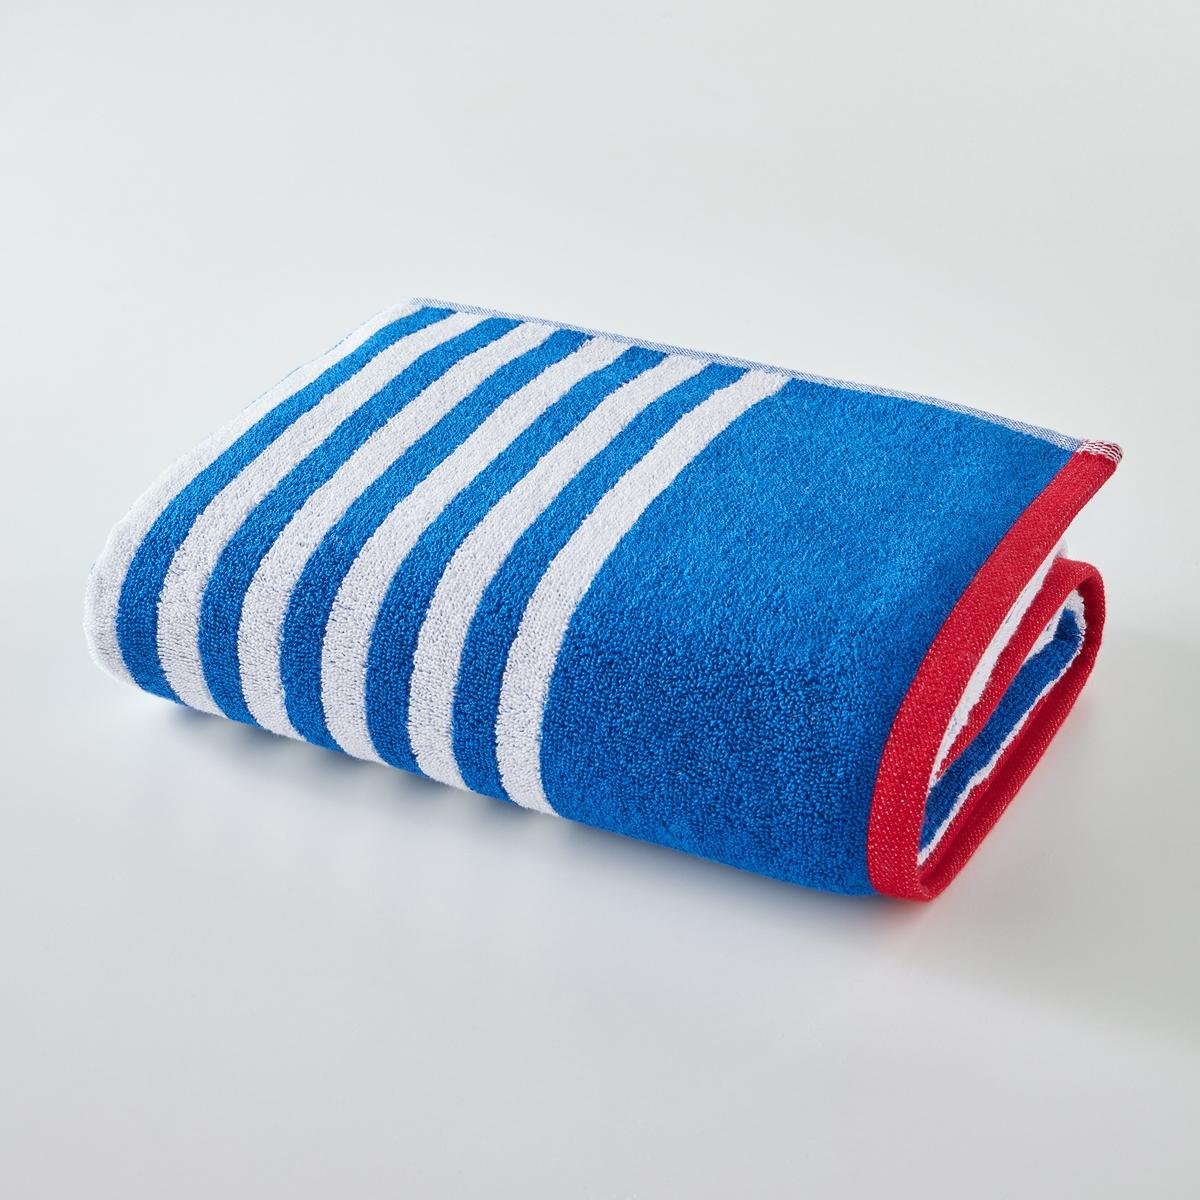 Полотенце в полоску 500 г/м²